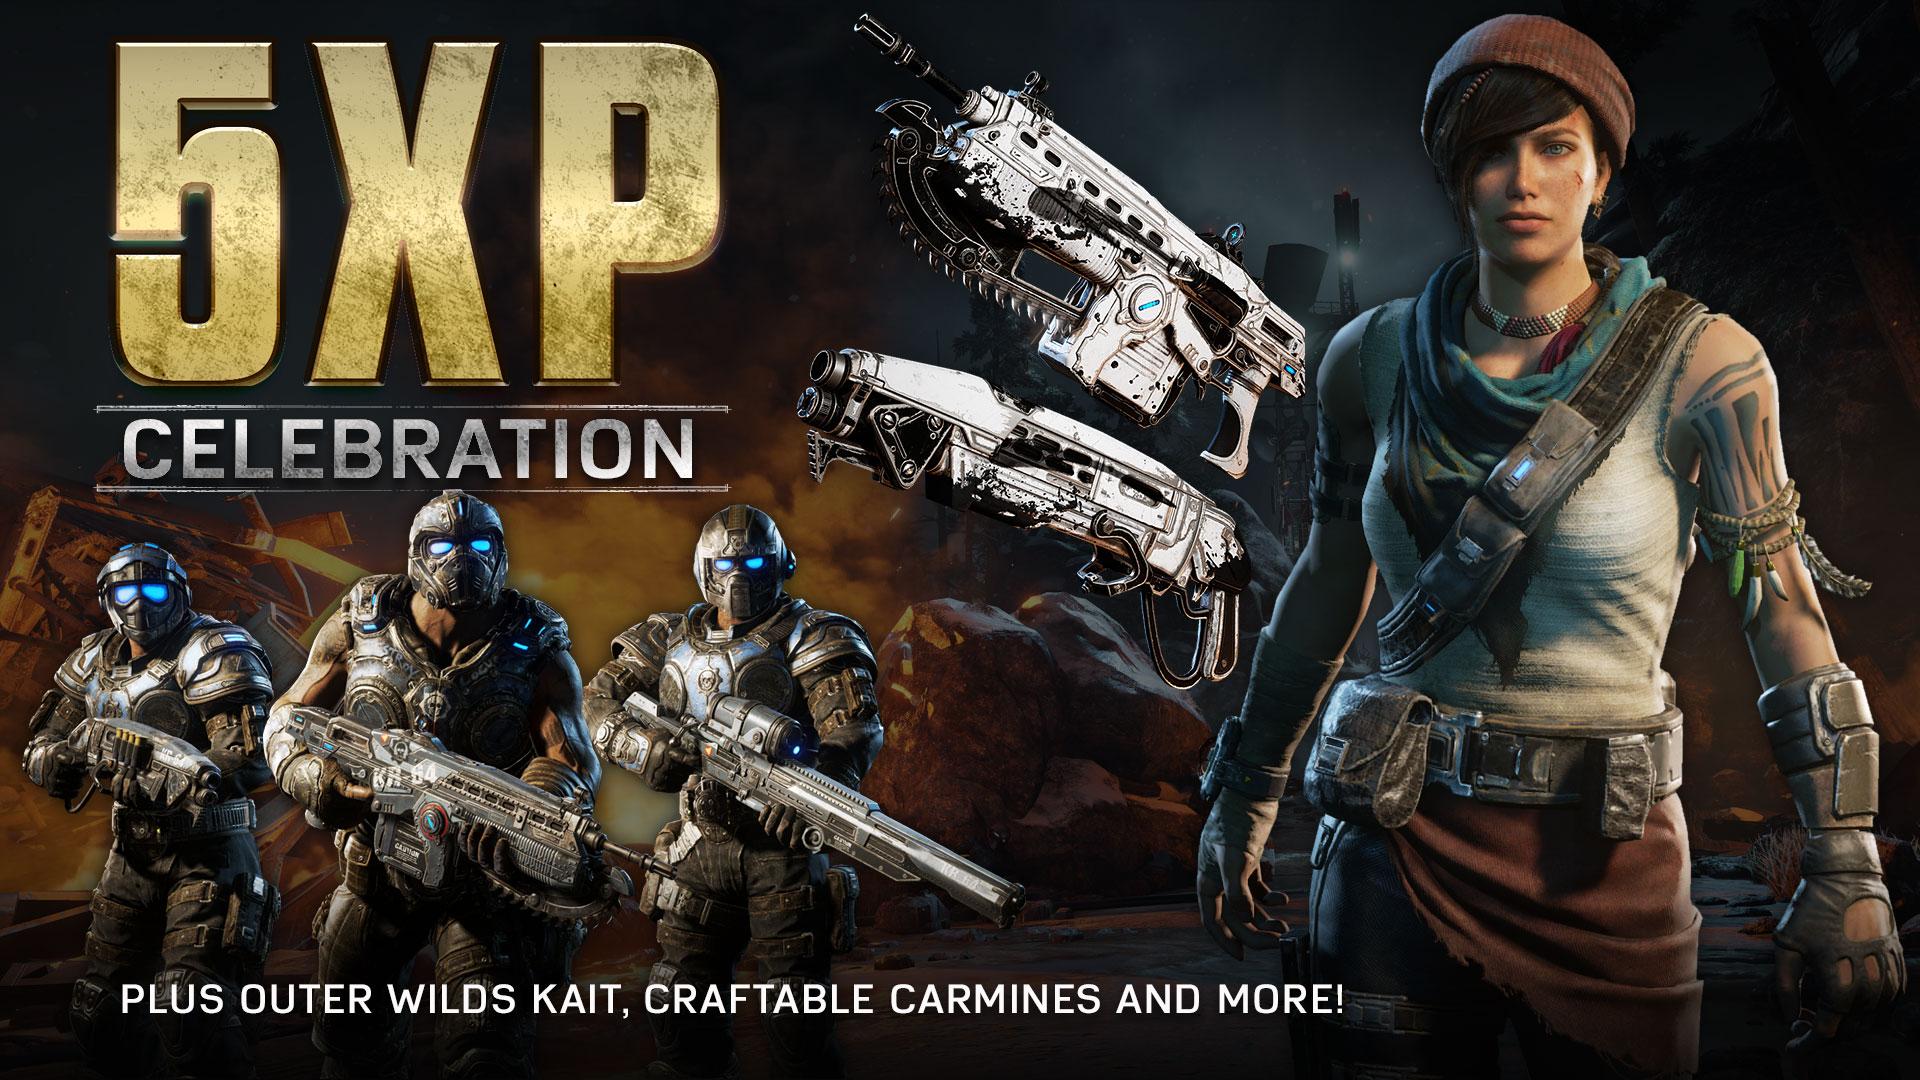 Xbox Gears Of War 4The Coalition Pgina 55 ZWAME Frum